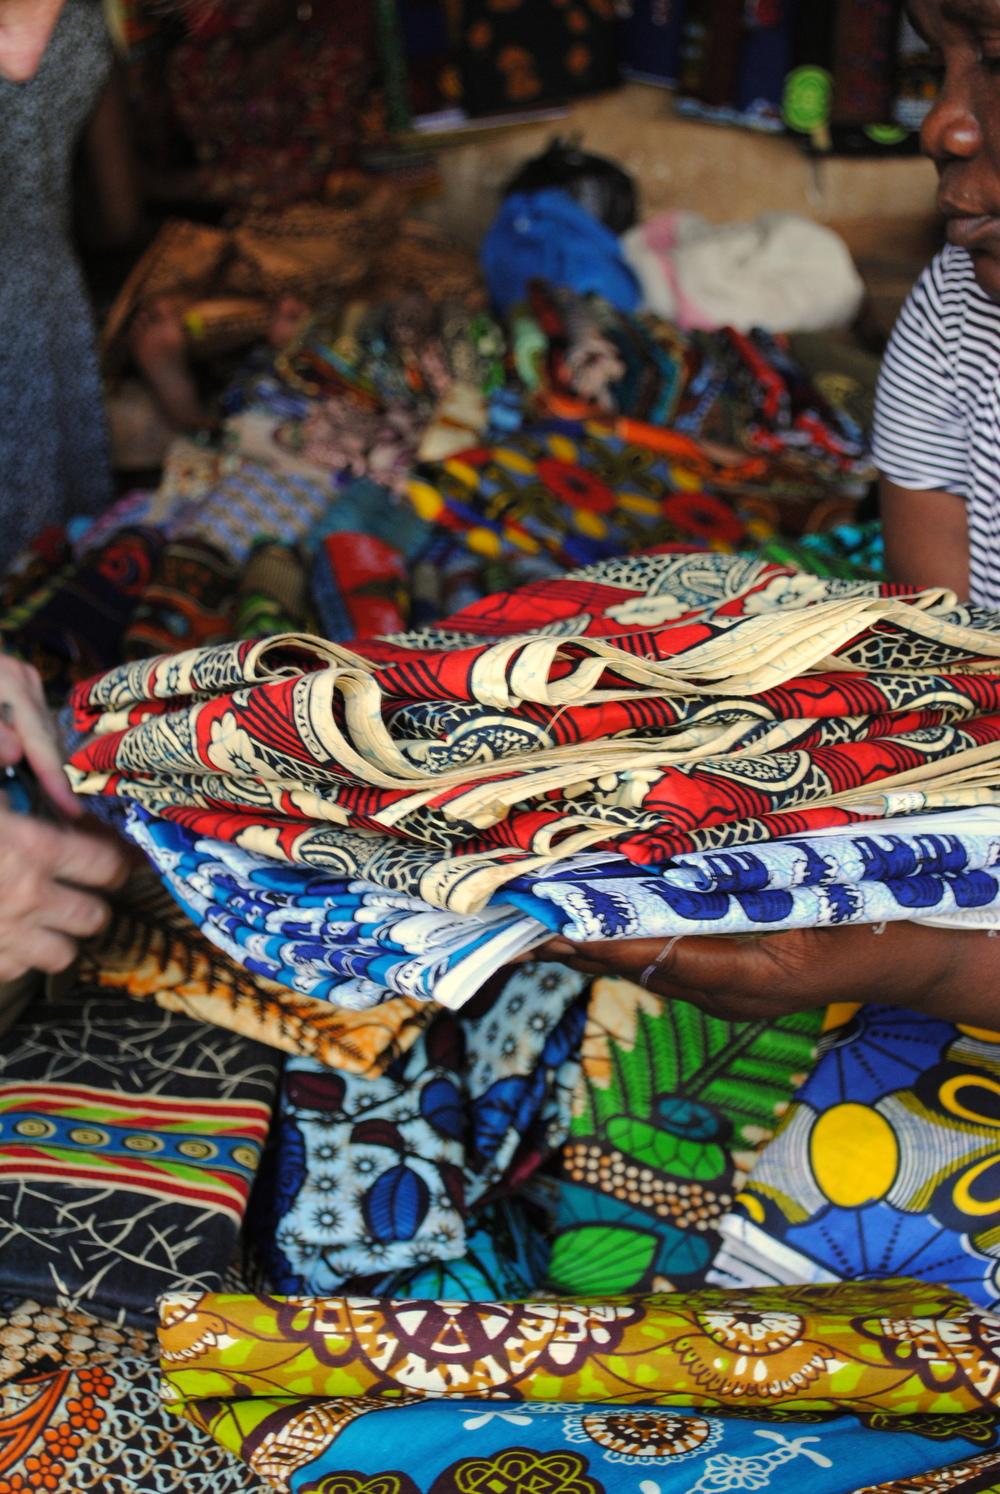 Inspecting chitenji in the Old Market